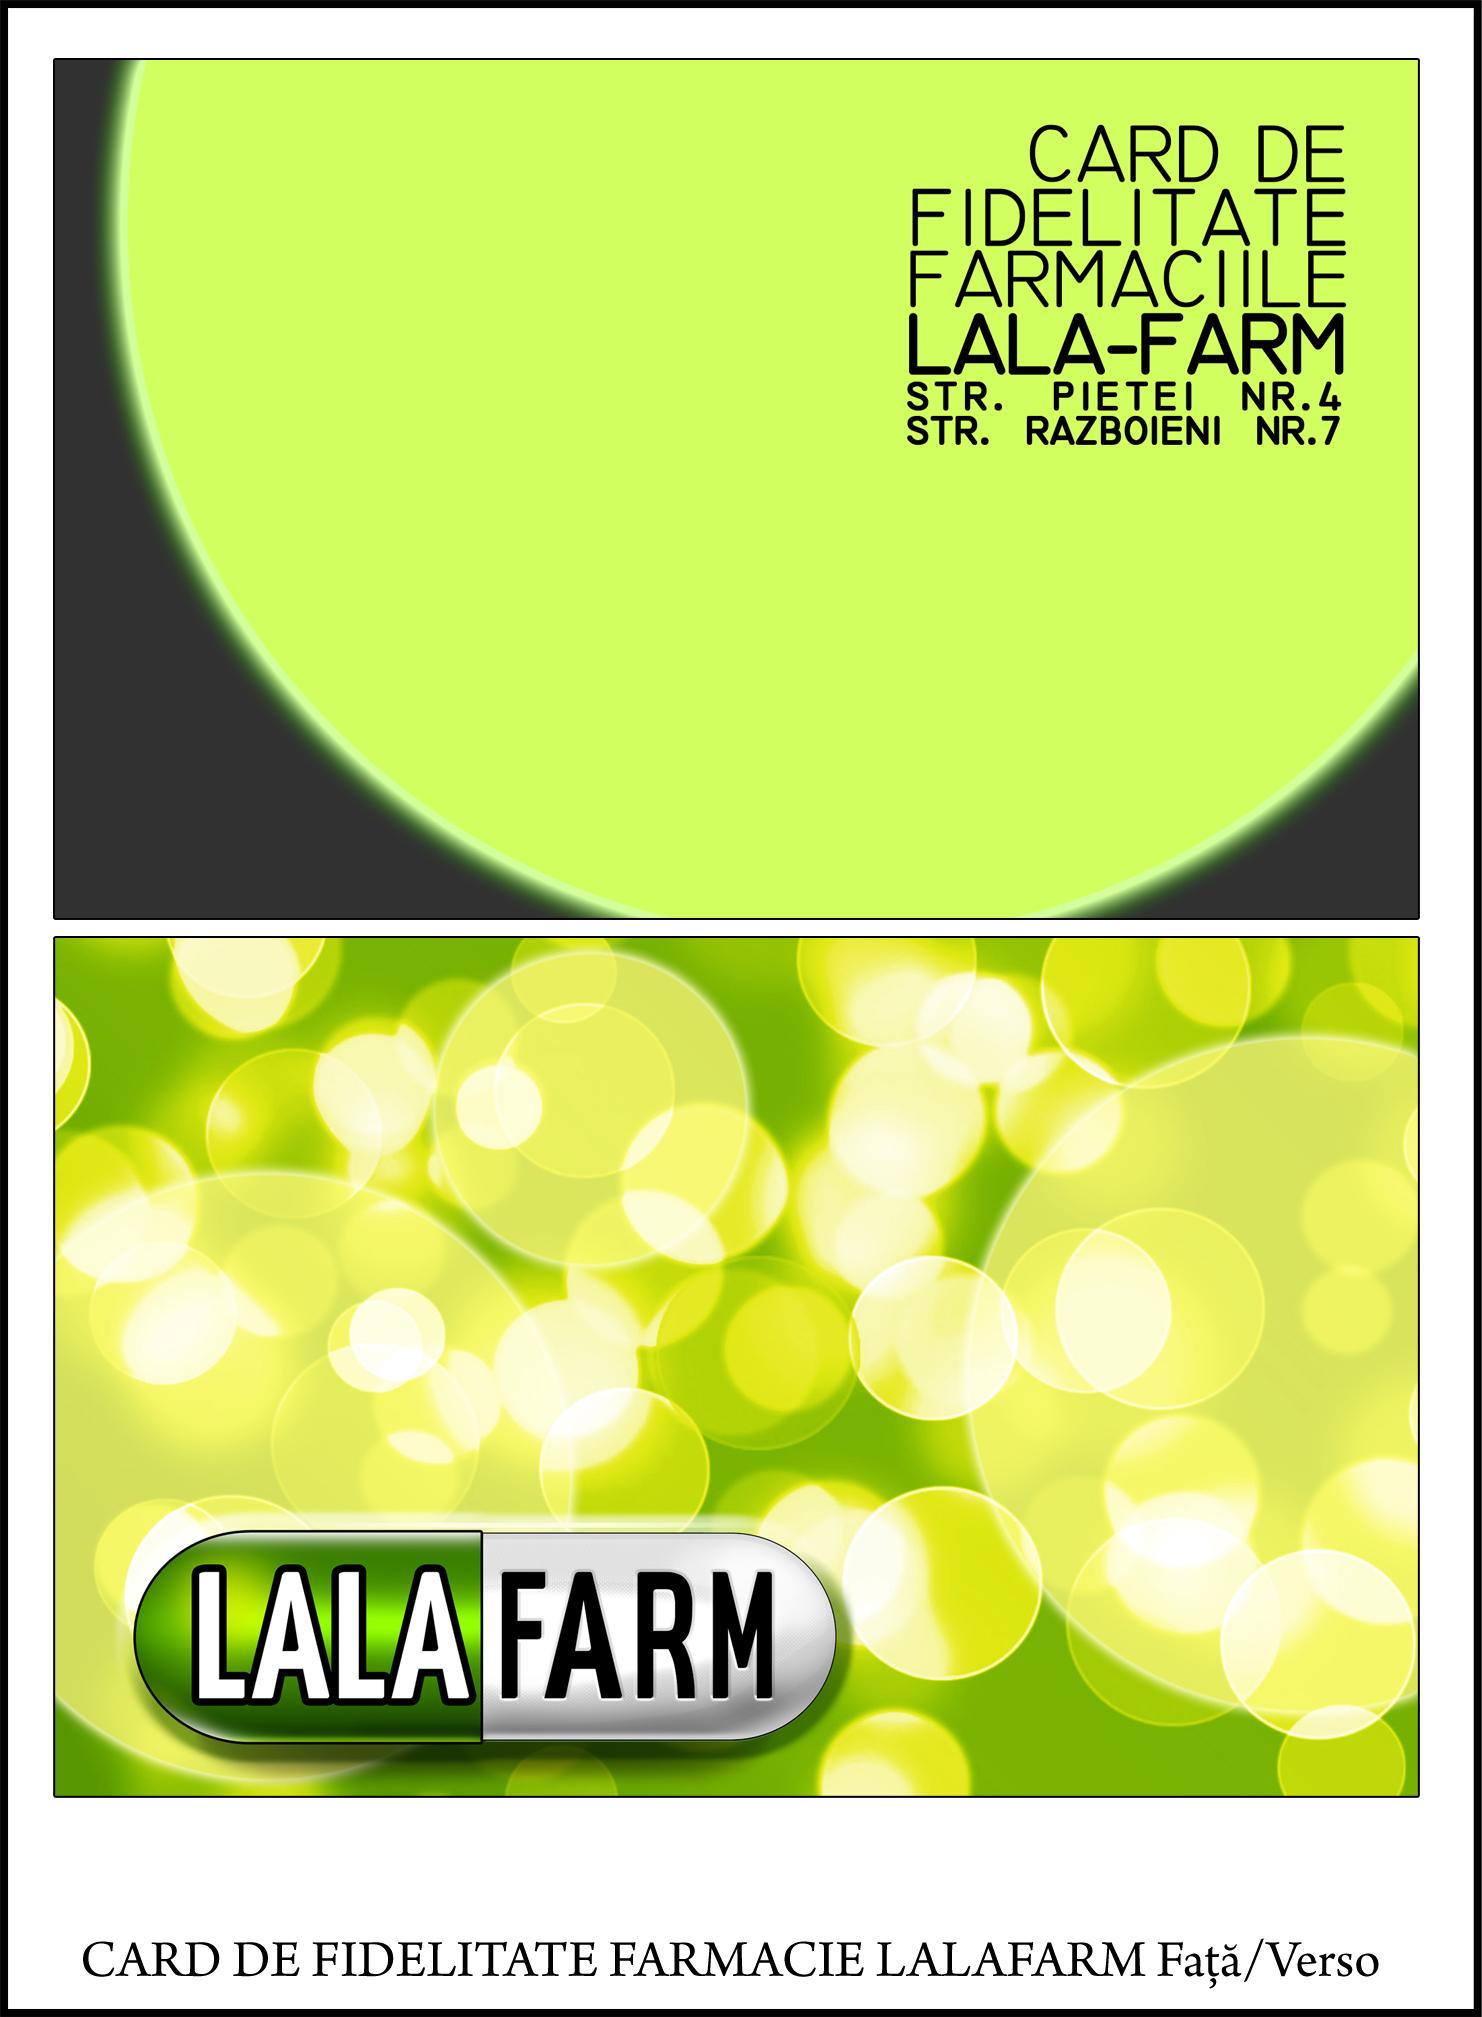 Card de fidelitate farmacie Lalafarm